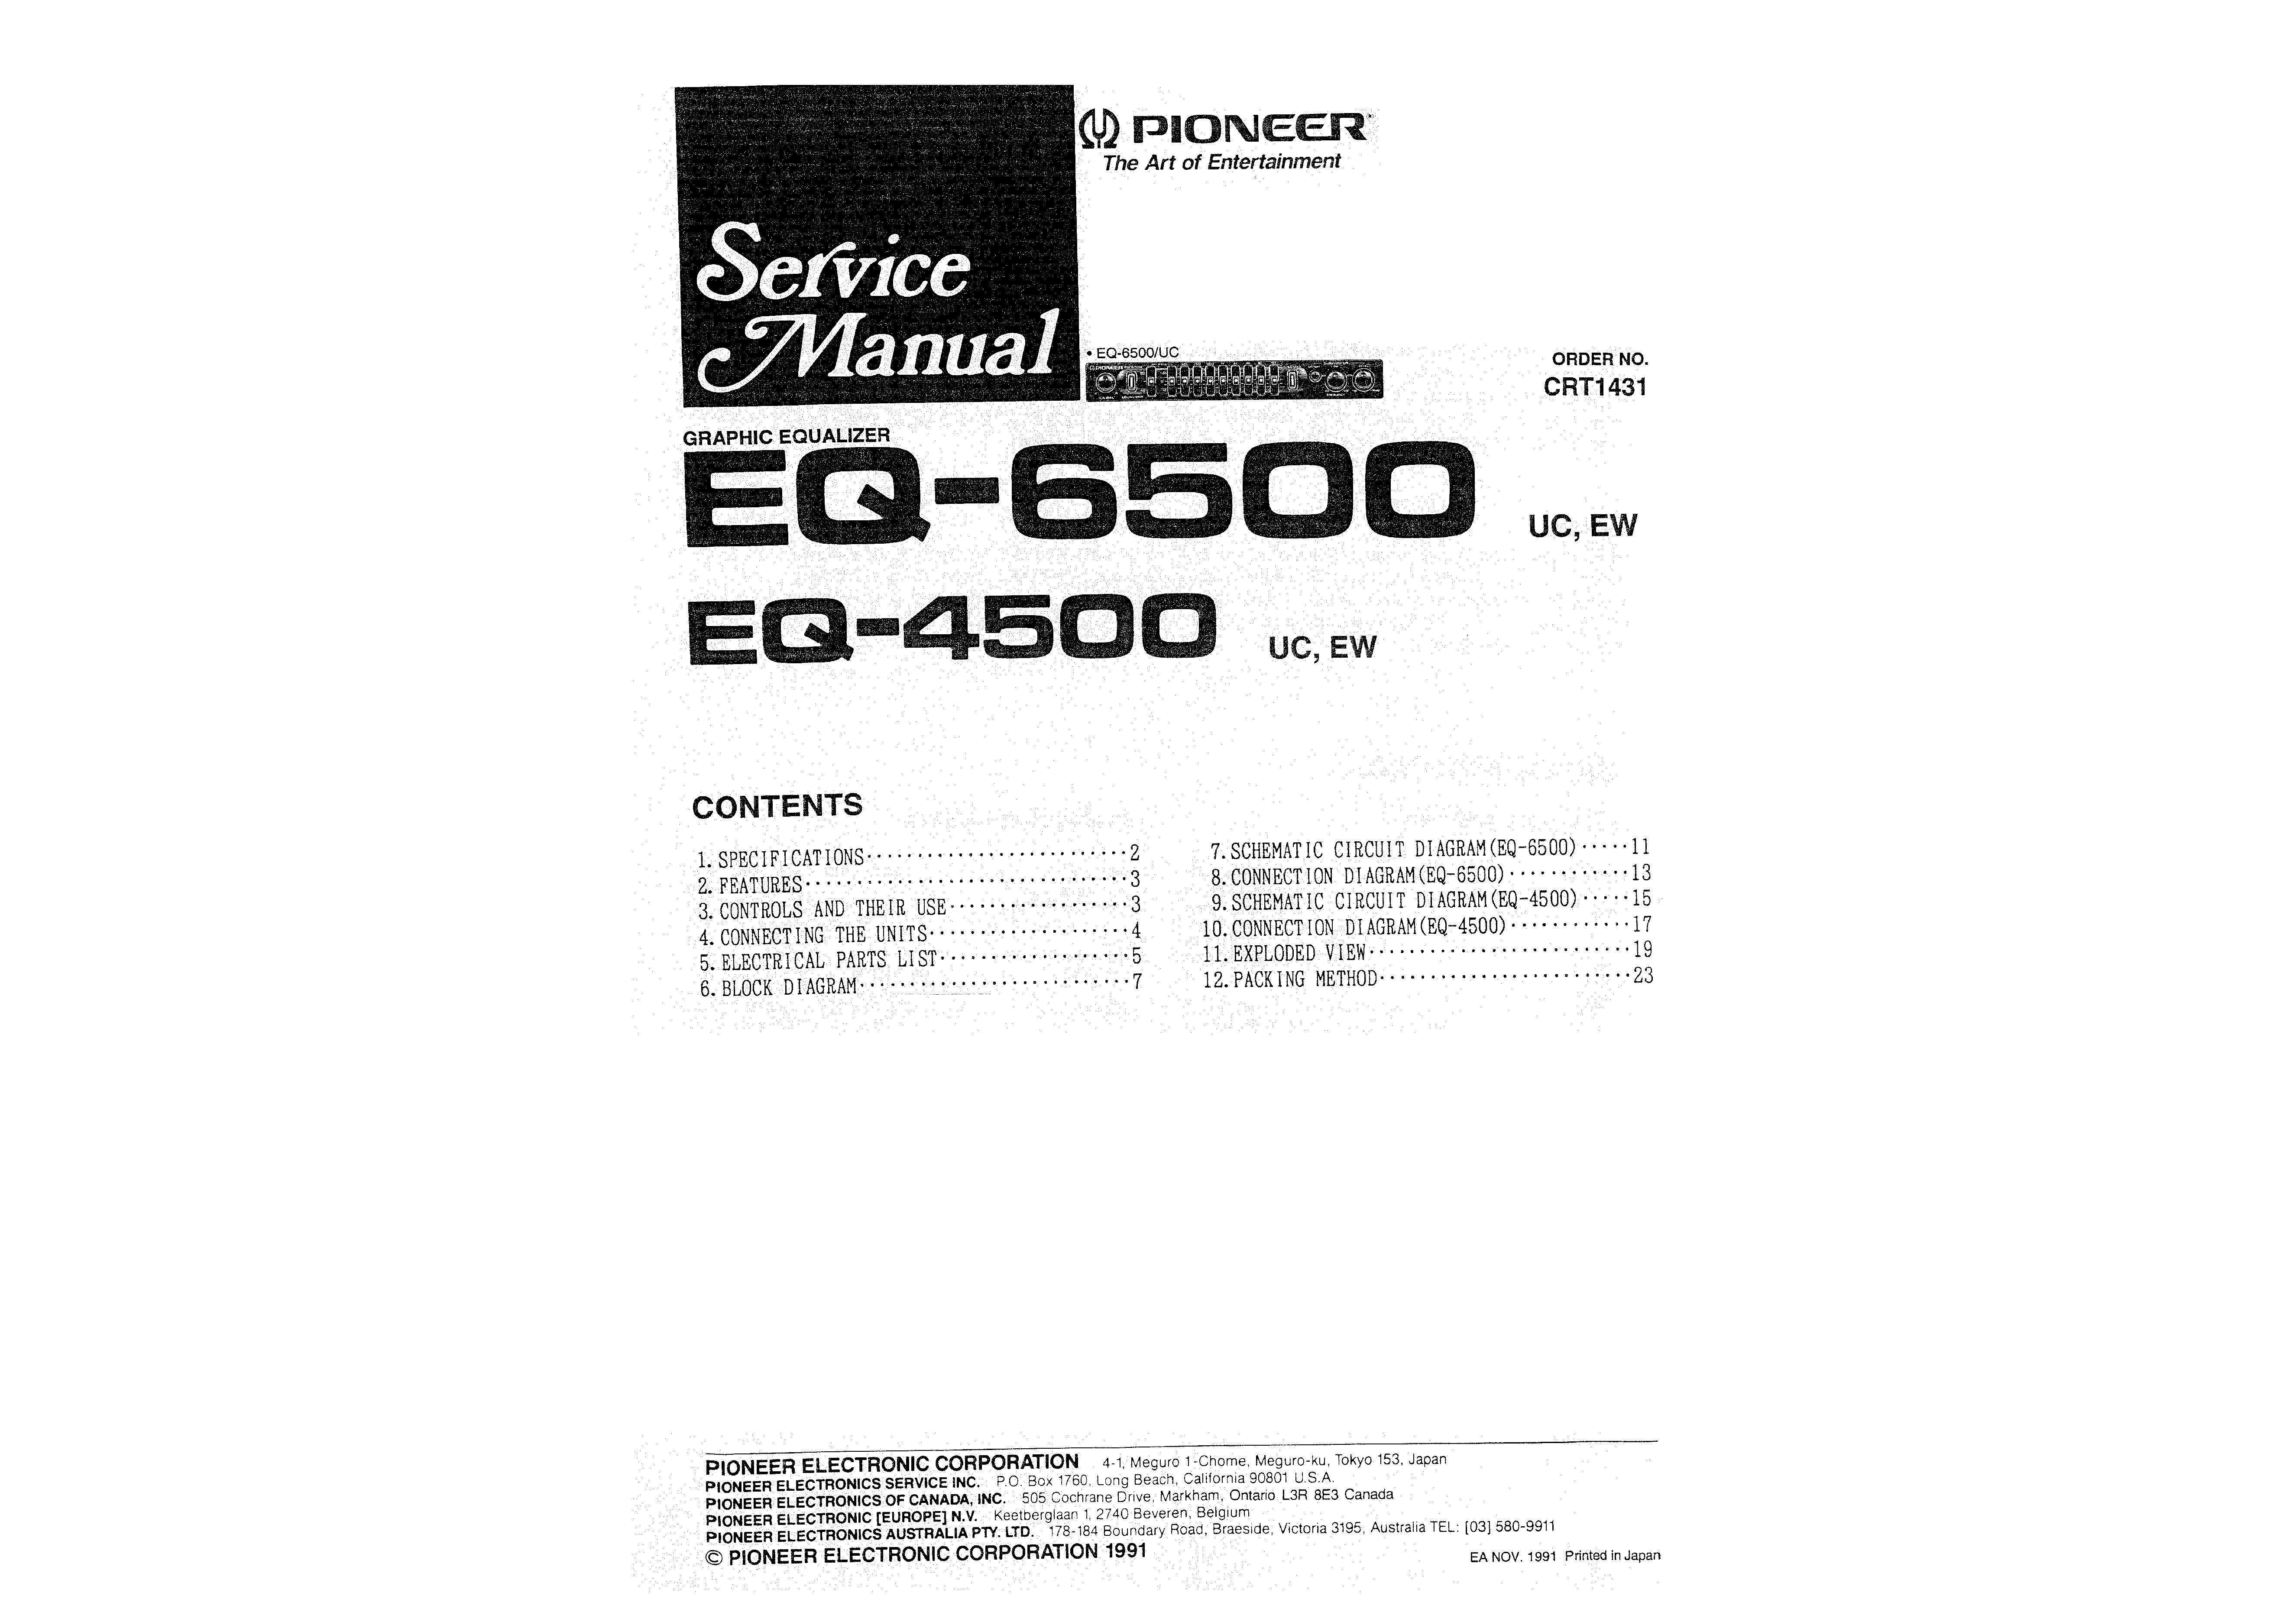 Service Manual For Pioneer Eq-4500 Uc Ew